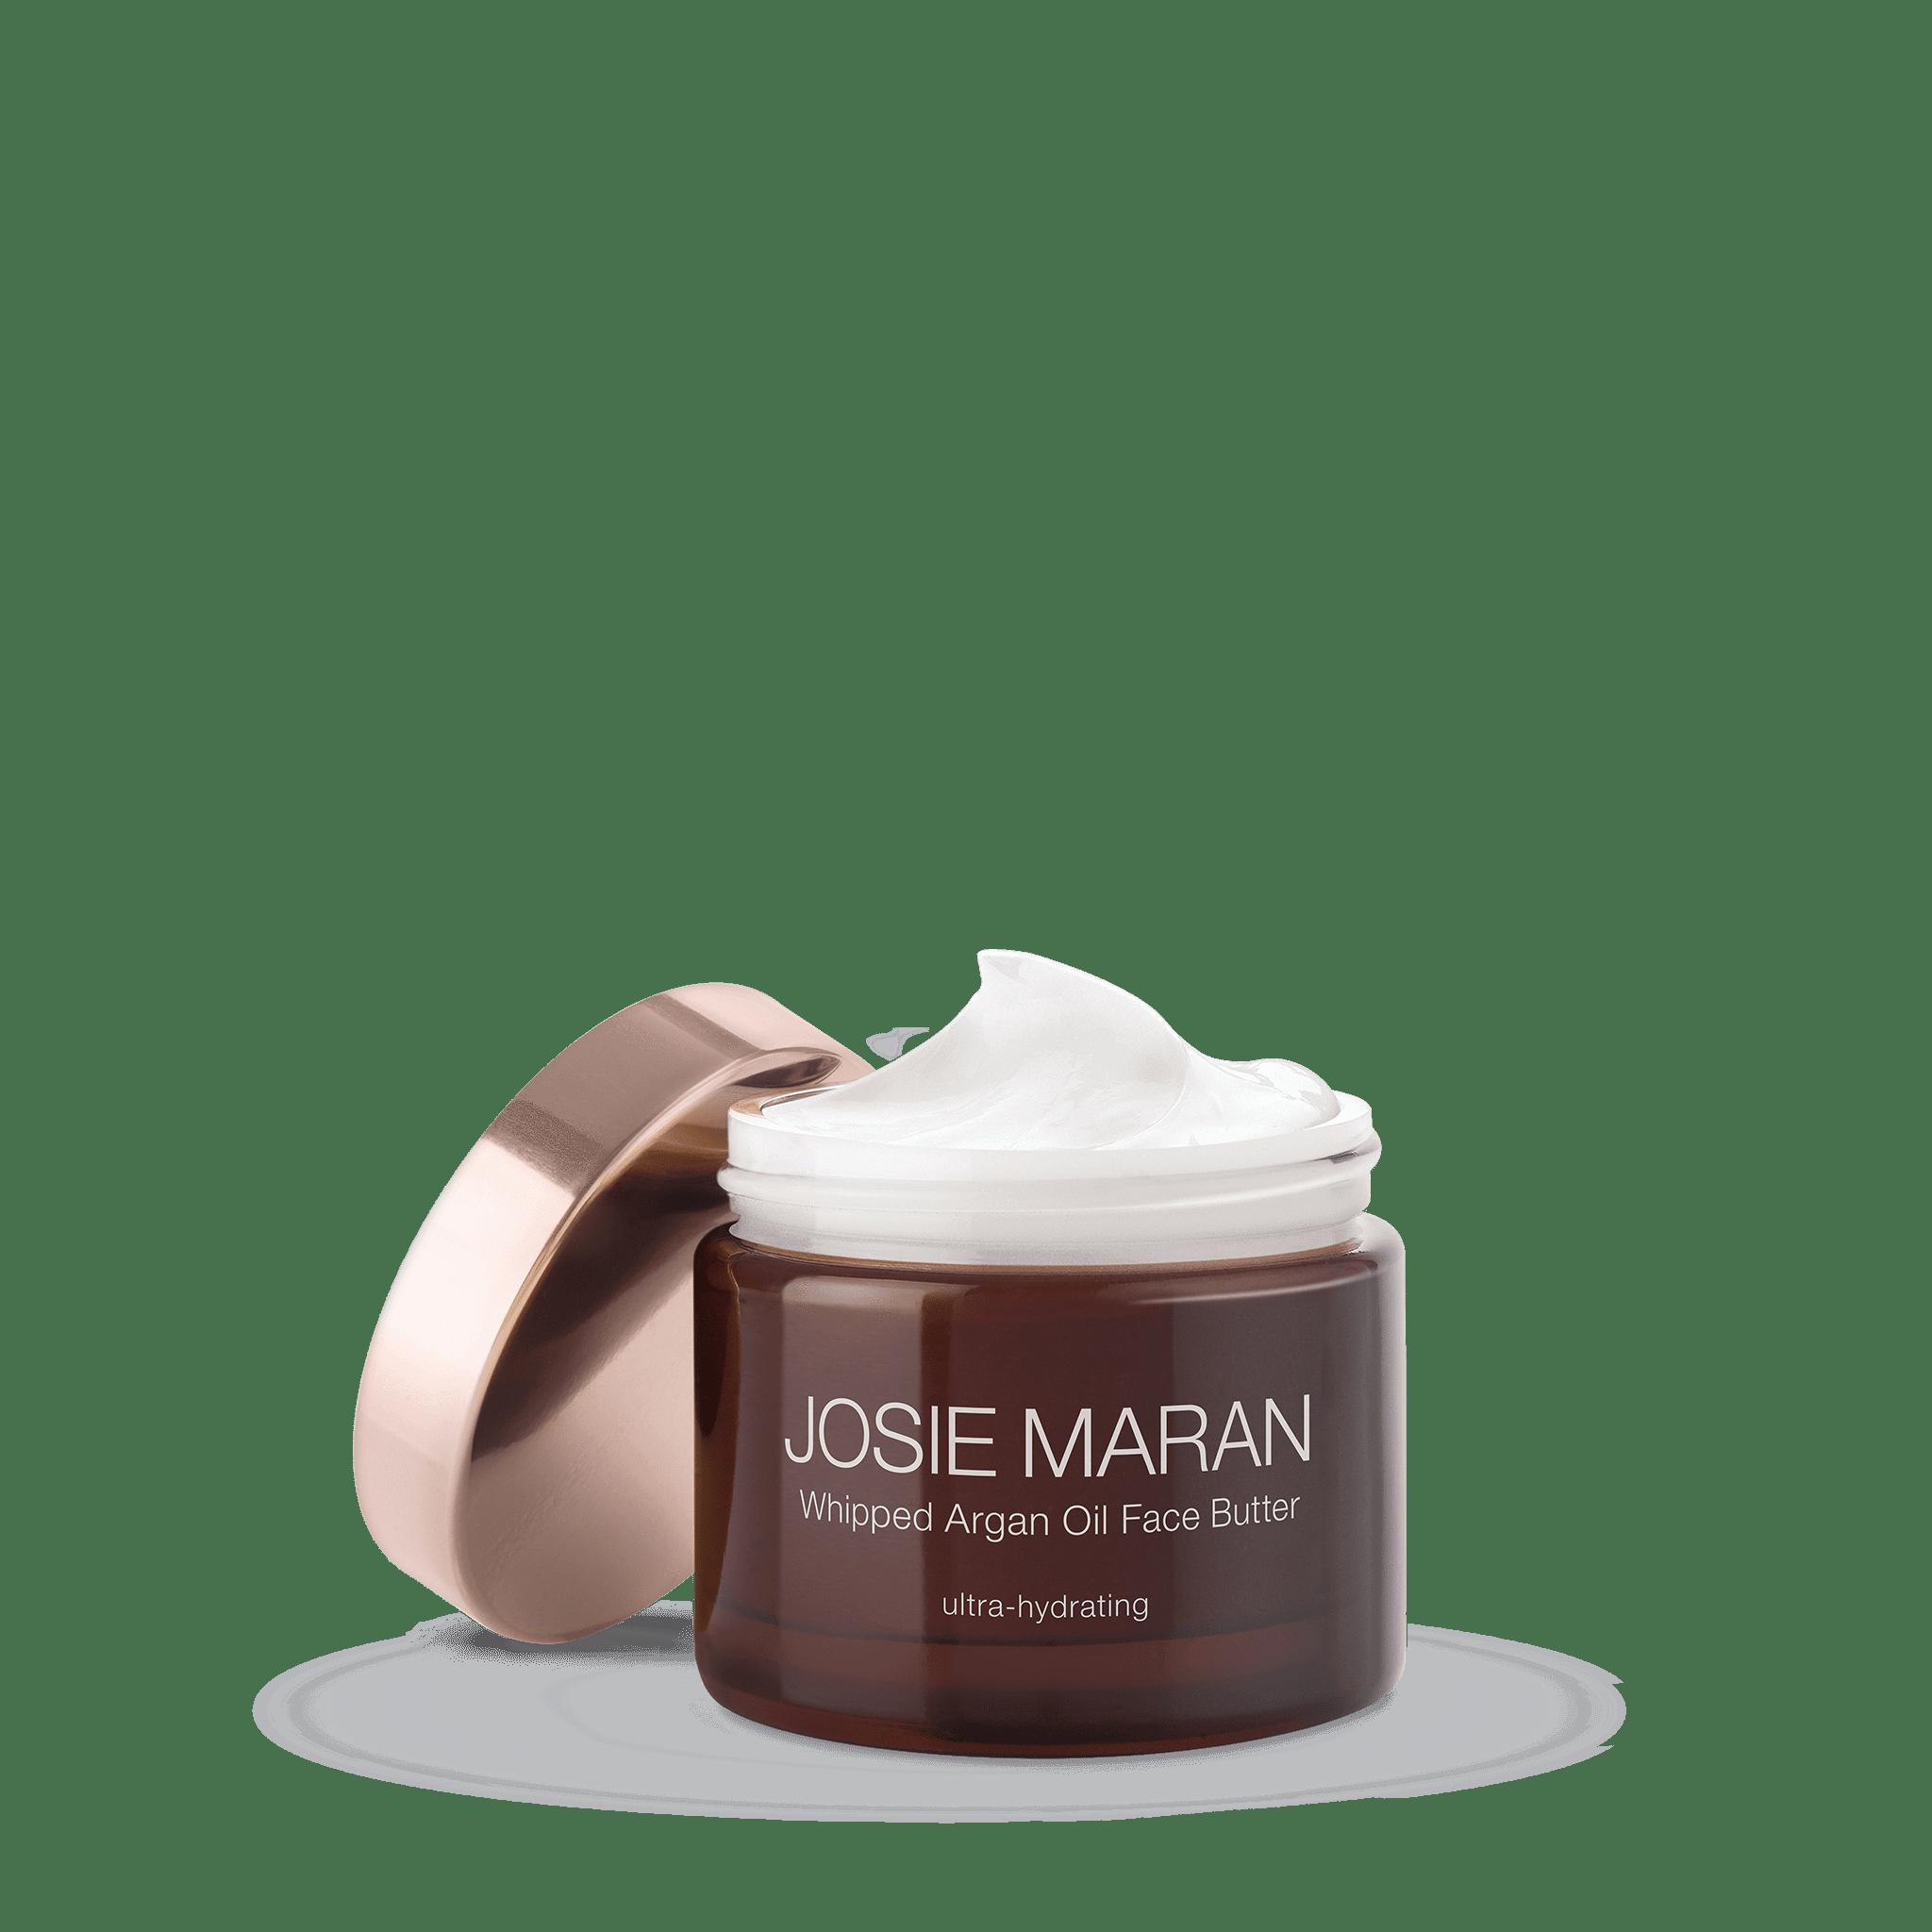 Josie Maran Whipped Argan Oil Face Butter Juicy Peach